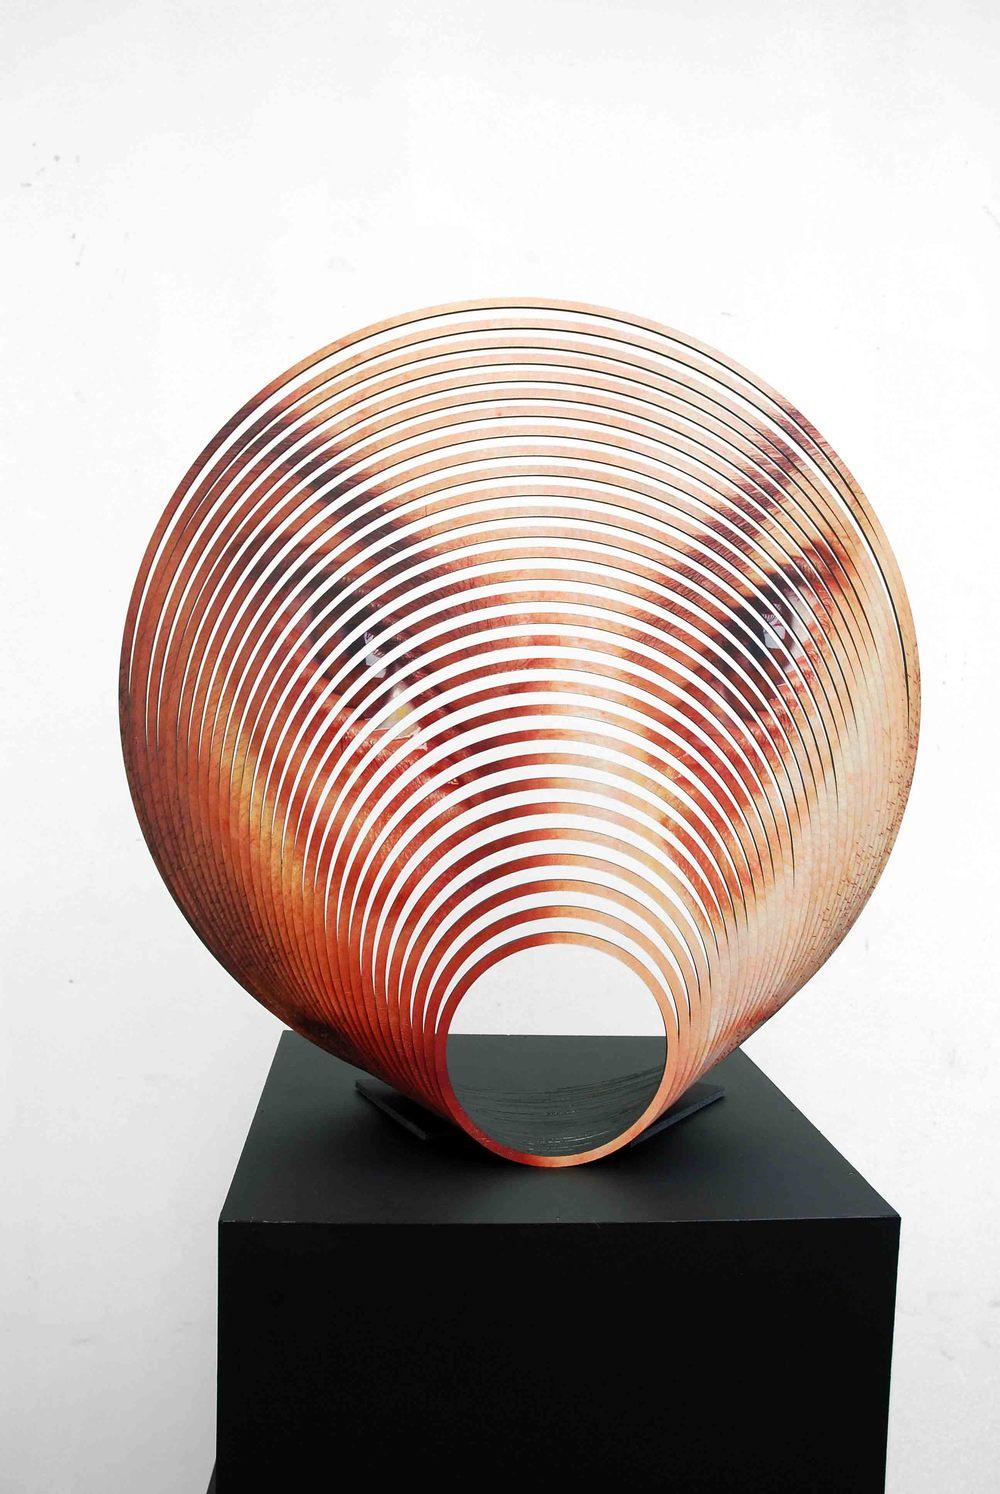 JUSTINE KHAMARA   Scalloped 2  2015 Laser-cut UV print on hoop pine plywood, acrylic paint 55 x 55 x 12 cm